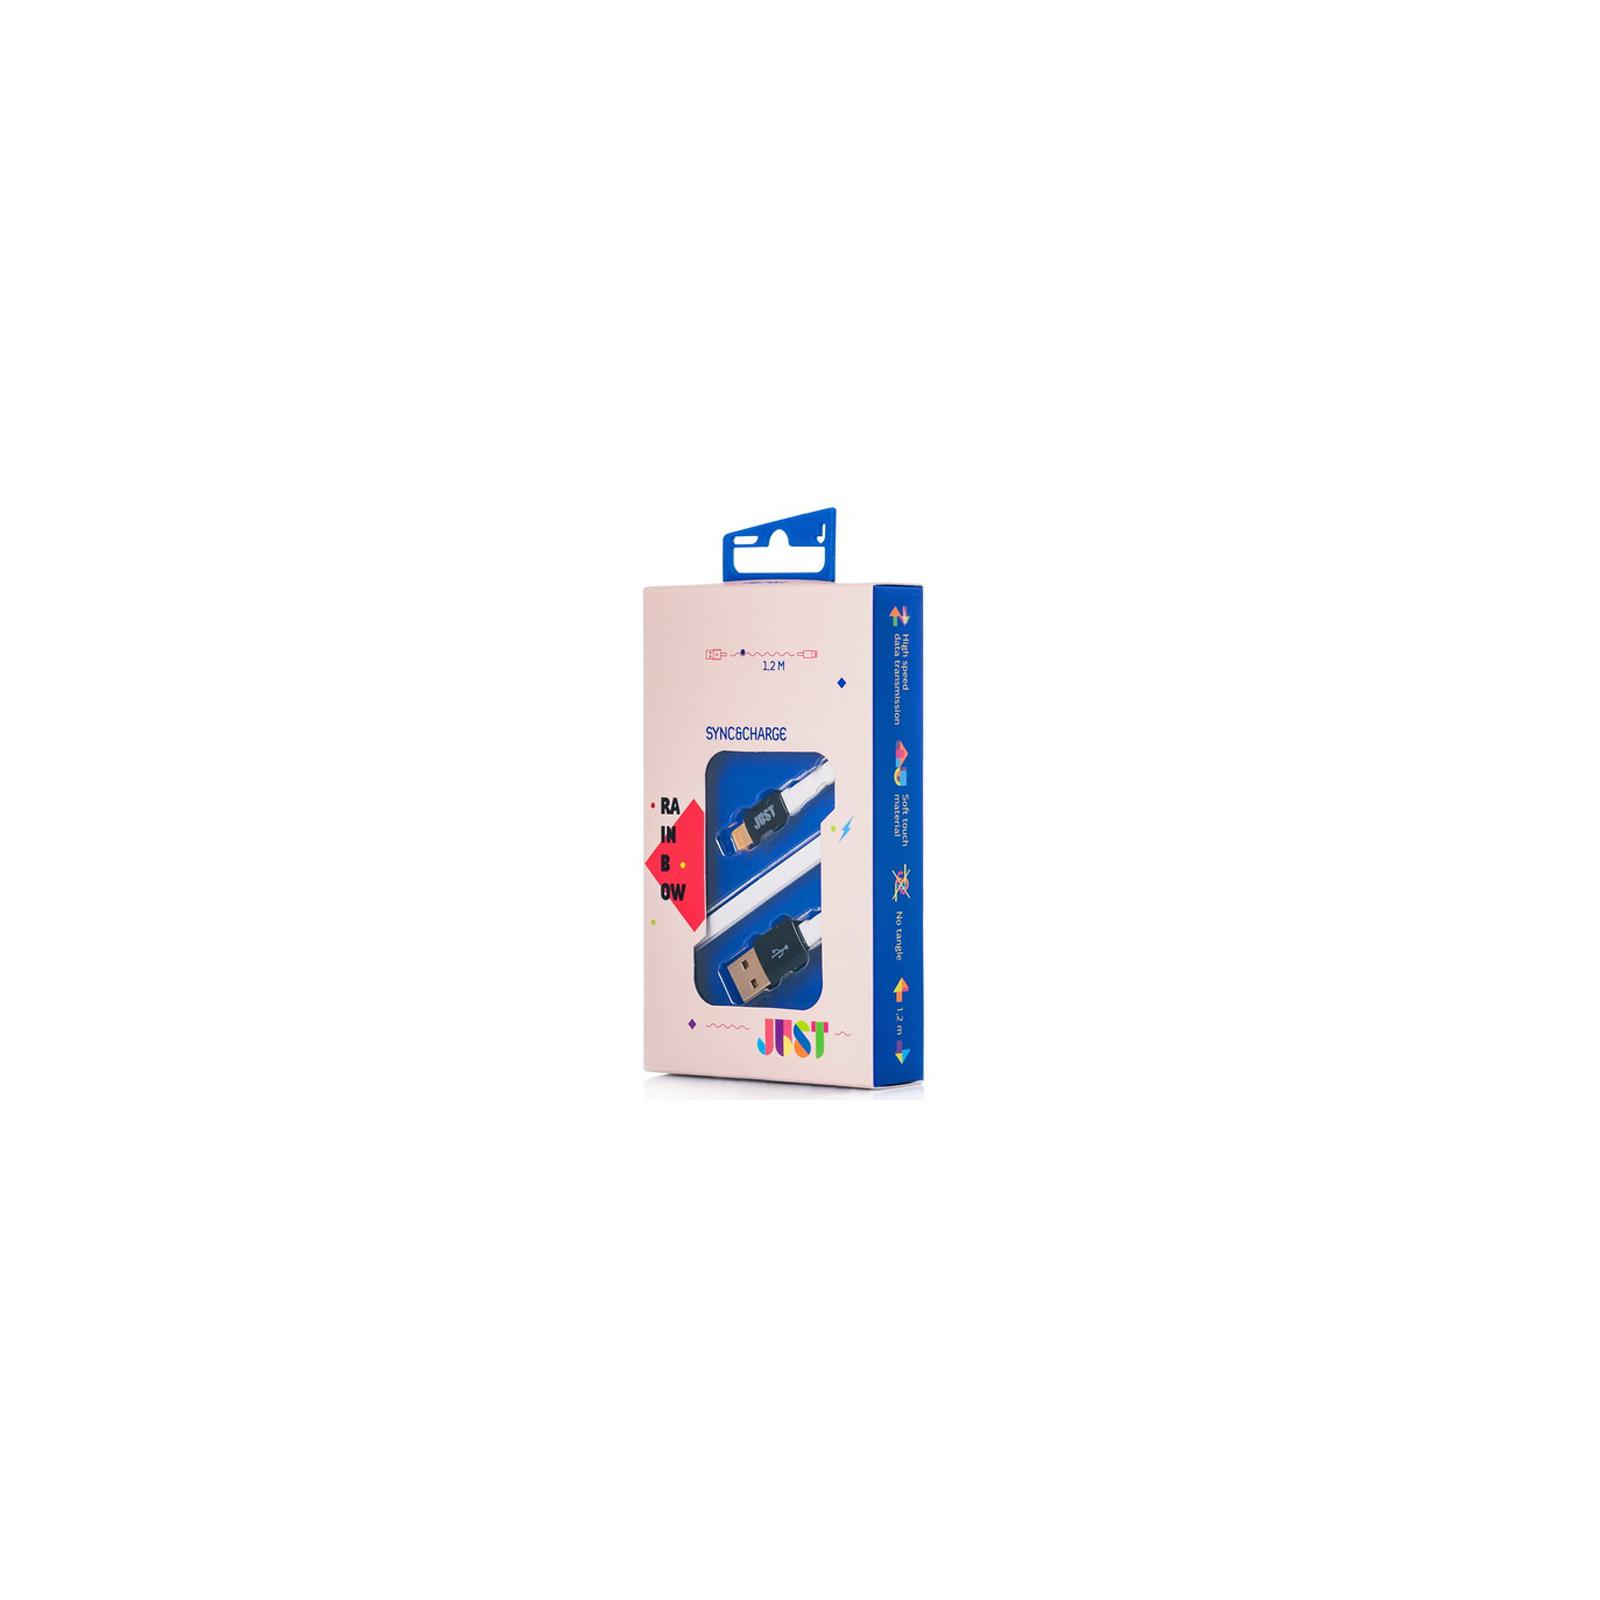 Дата кабель JUST Rainbow Lightning USB Cable White (LGTNG-RNBW-WHT) изображение 2